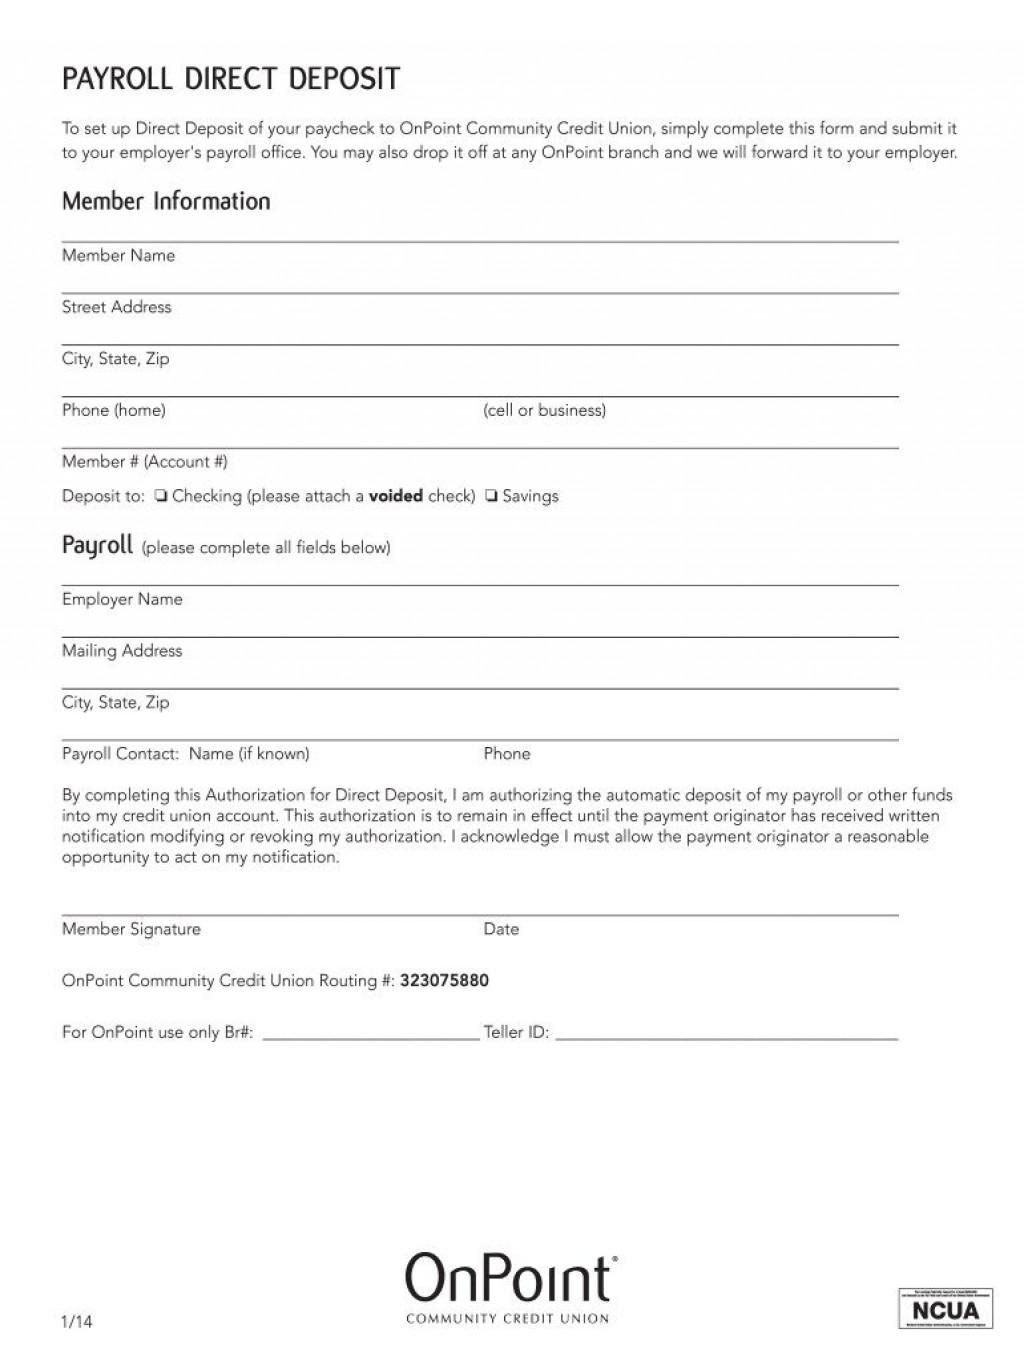 007 Amazing Direct Deposit Form Template Photo  Multiple Account Ach AuthorizationLarge